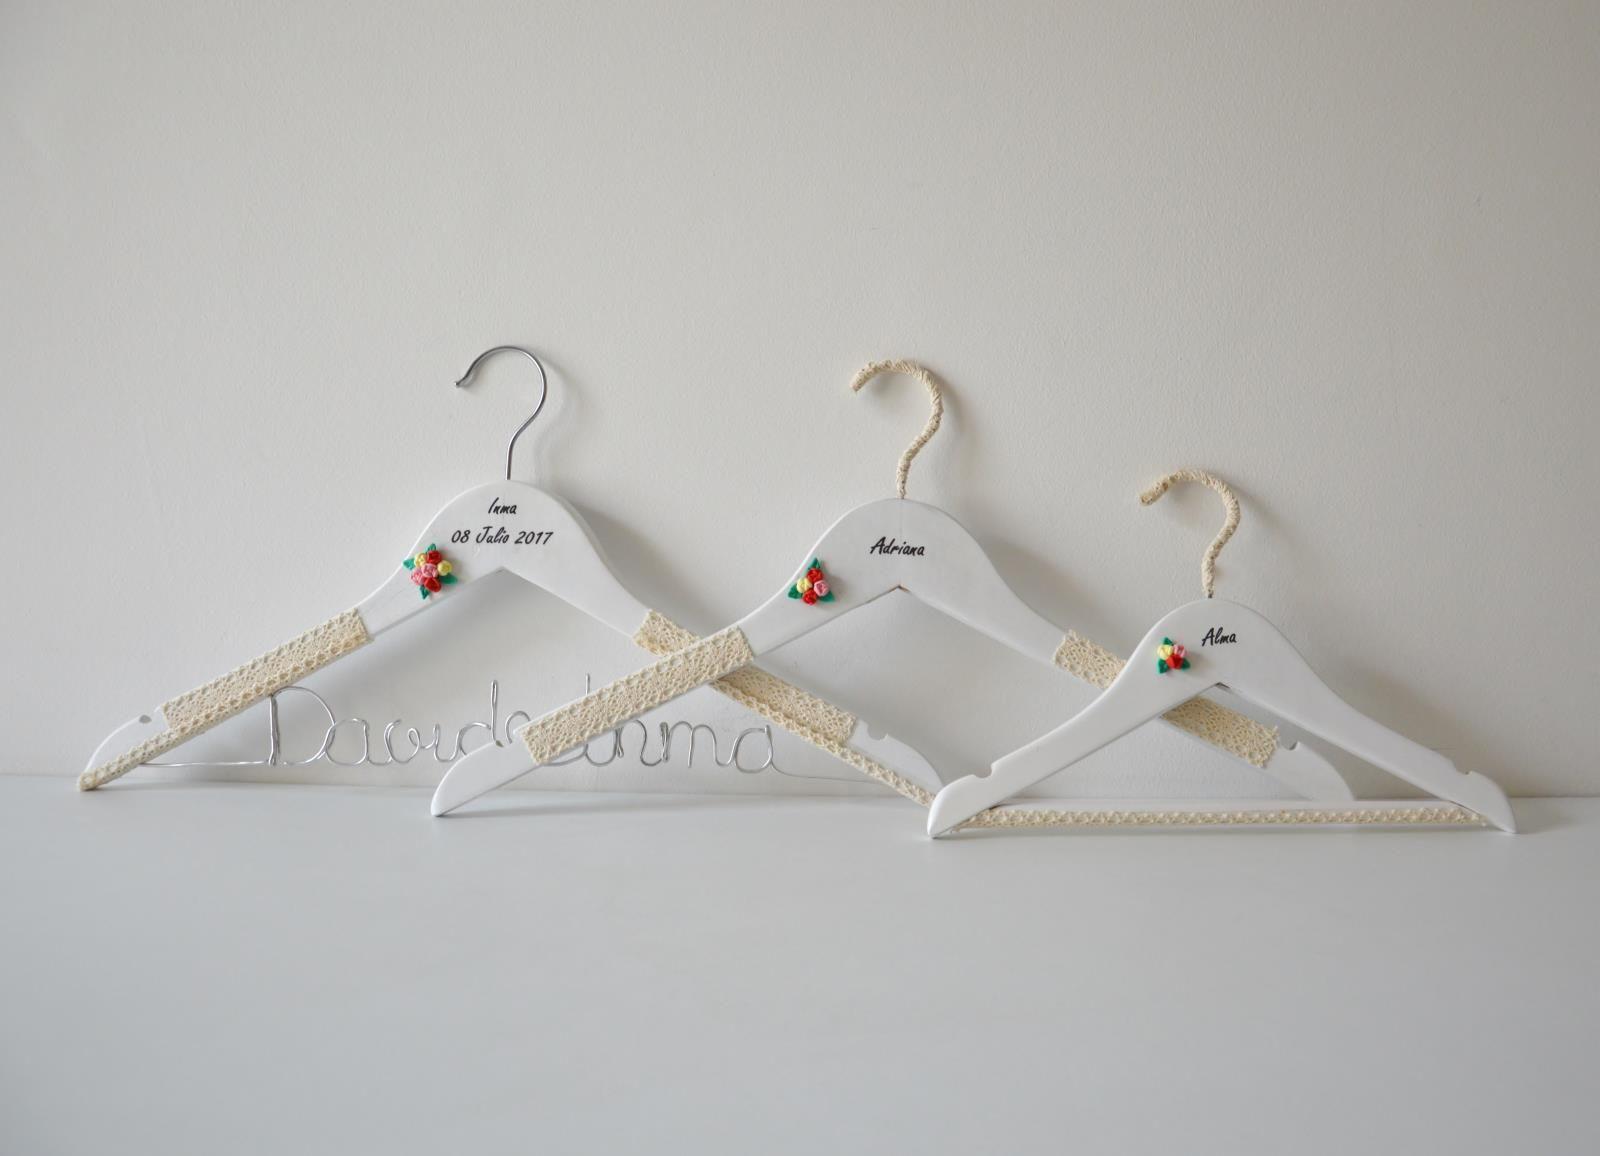 Detalles Para Bodas Perchas Personalizadas Para La Novia Y Sus  ~ Perchas Personalizadas Para Tiendas